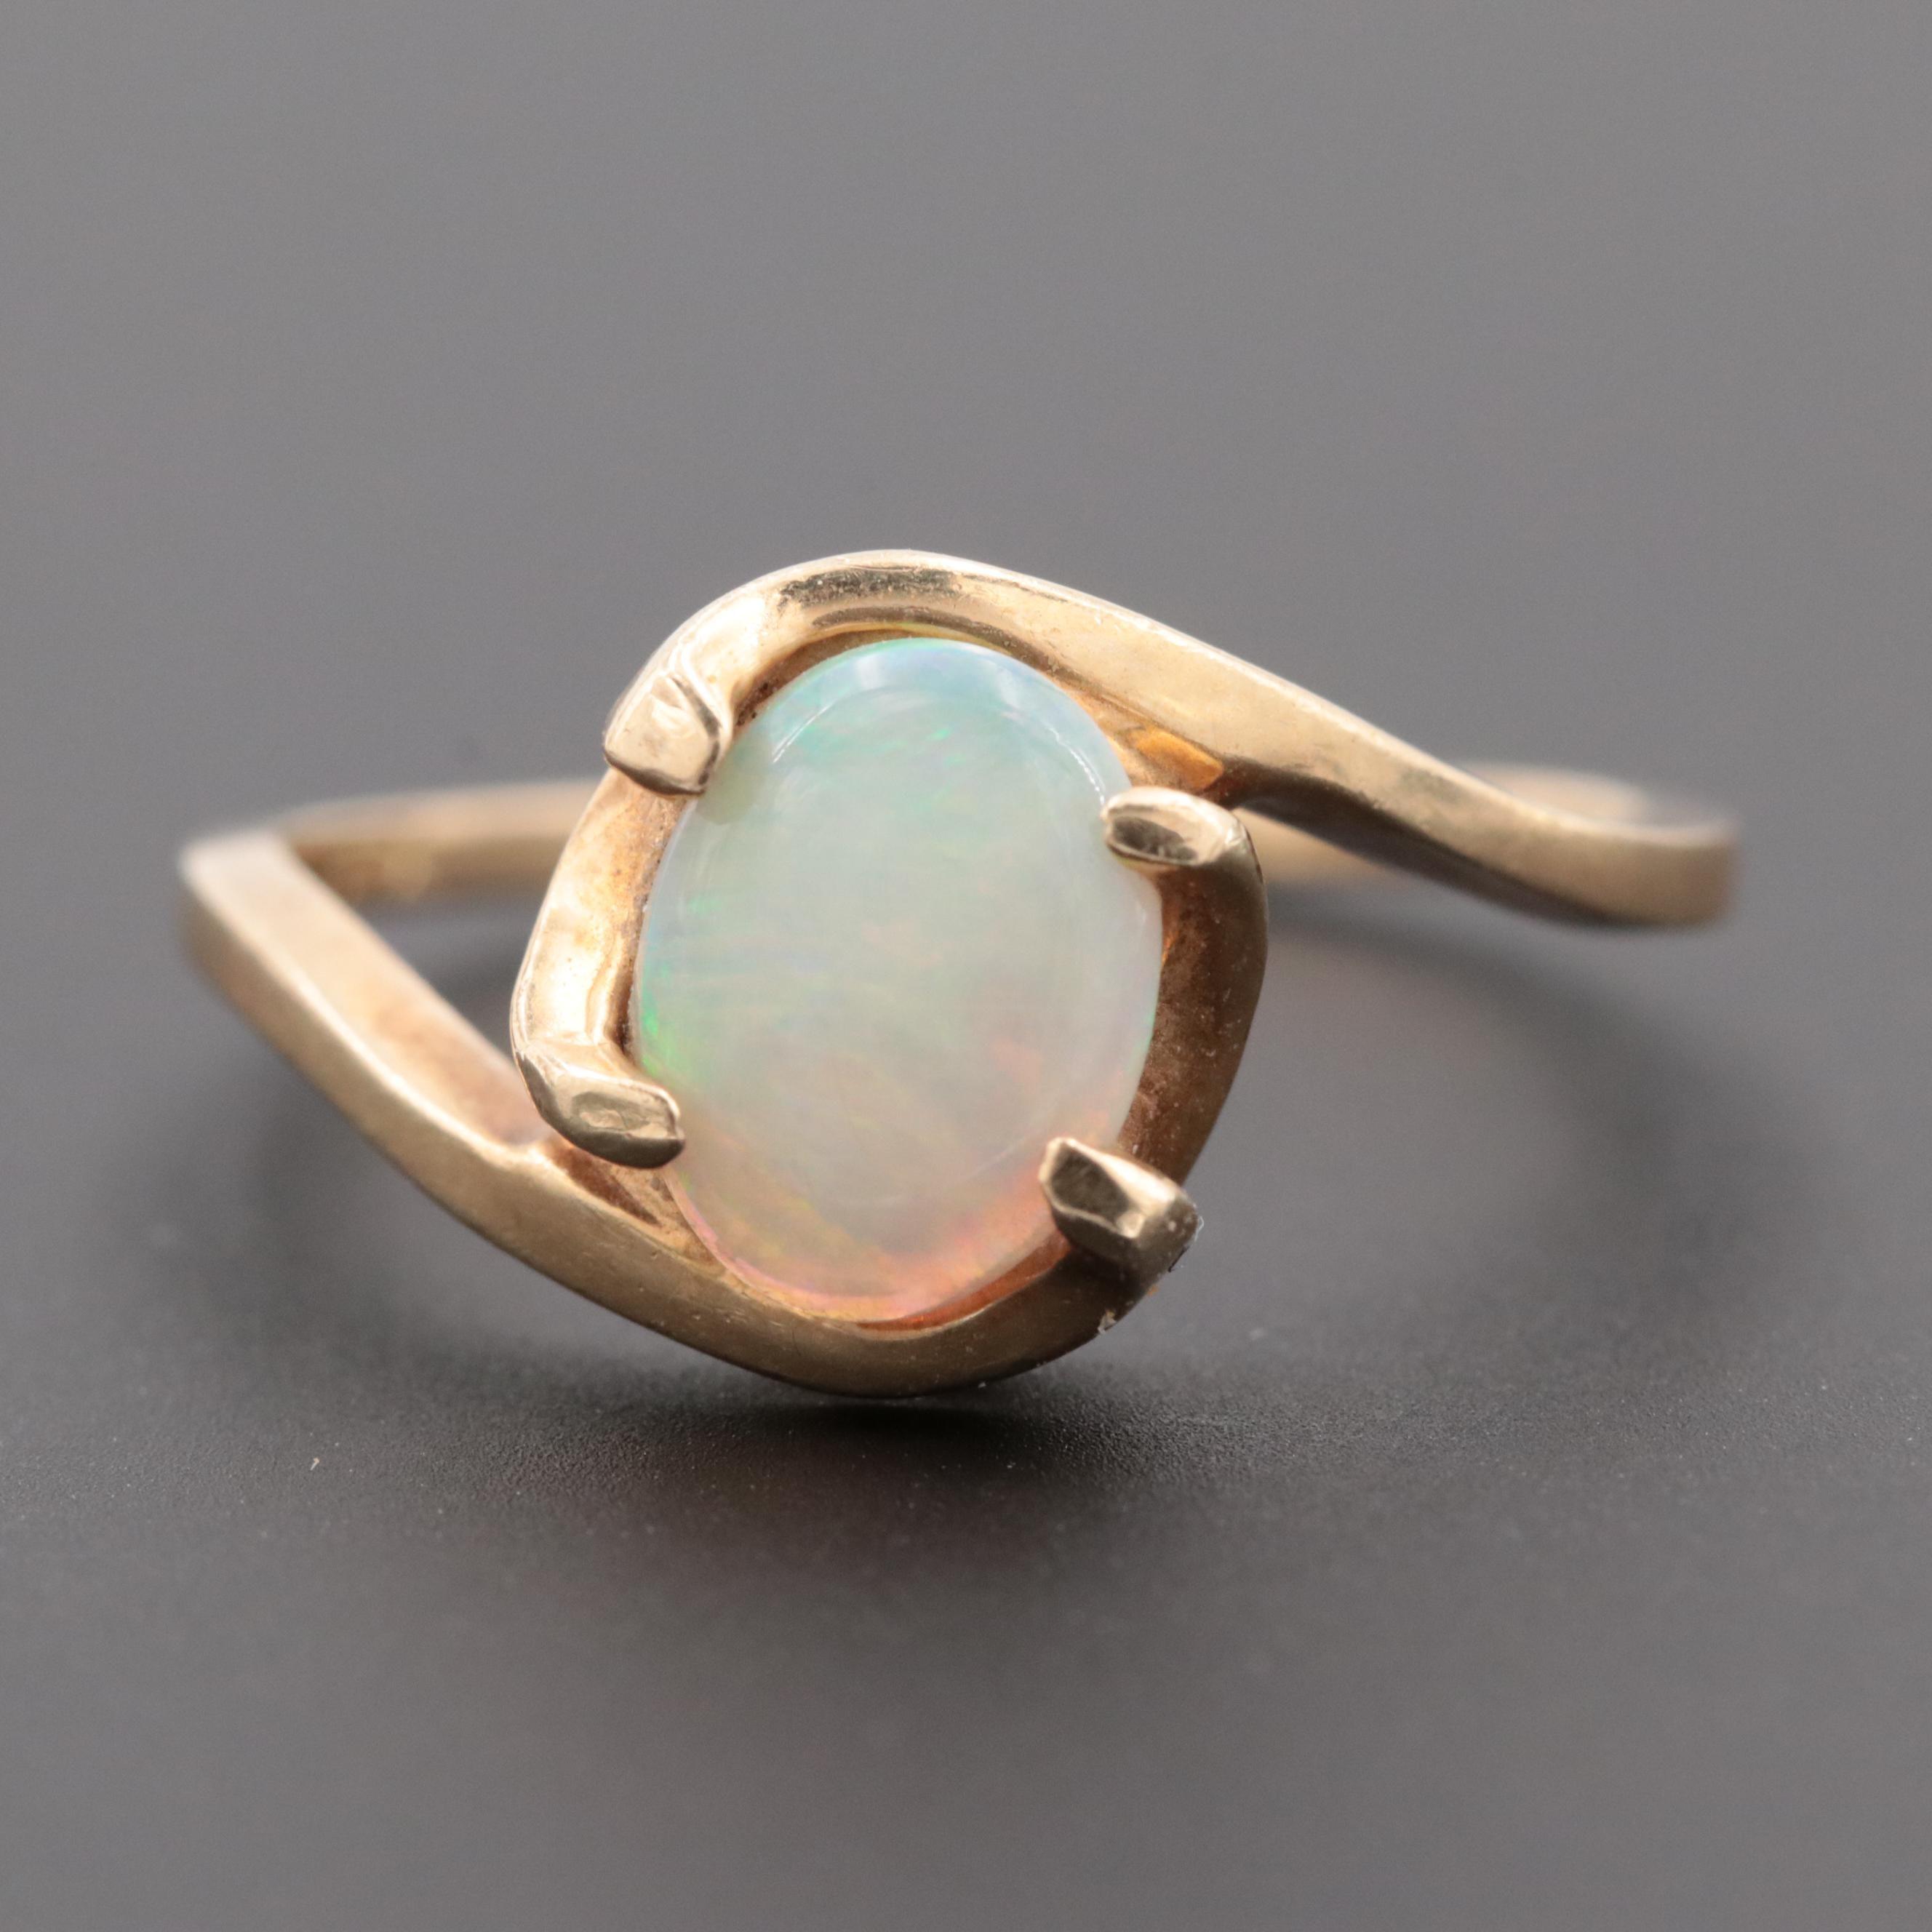 10K Yellow Gold Opal Bypass Ring